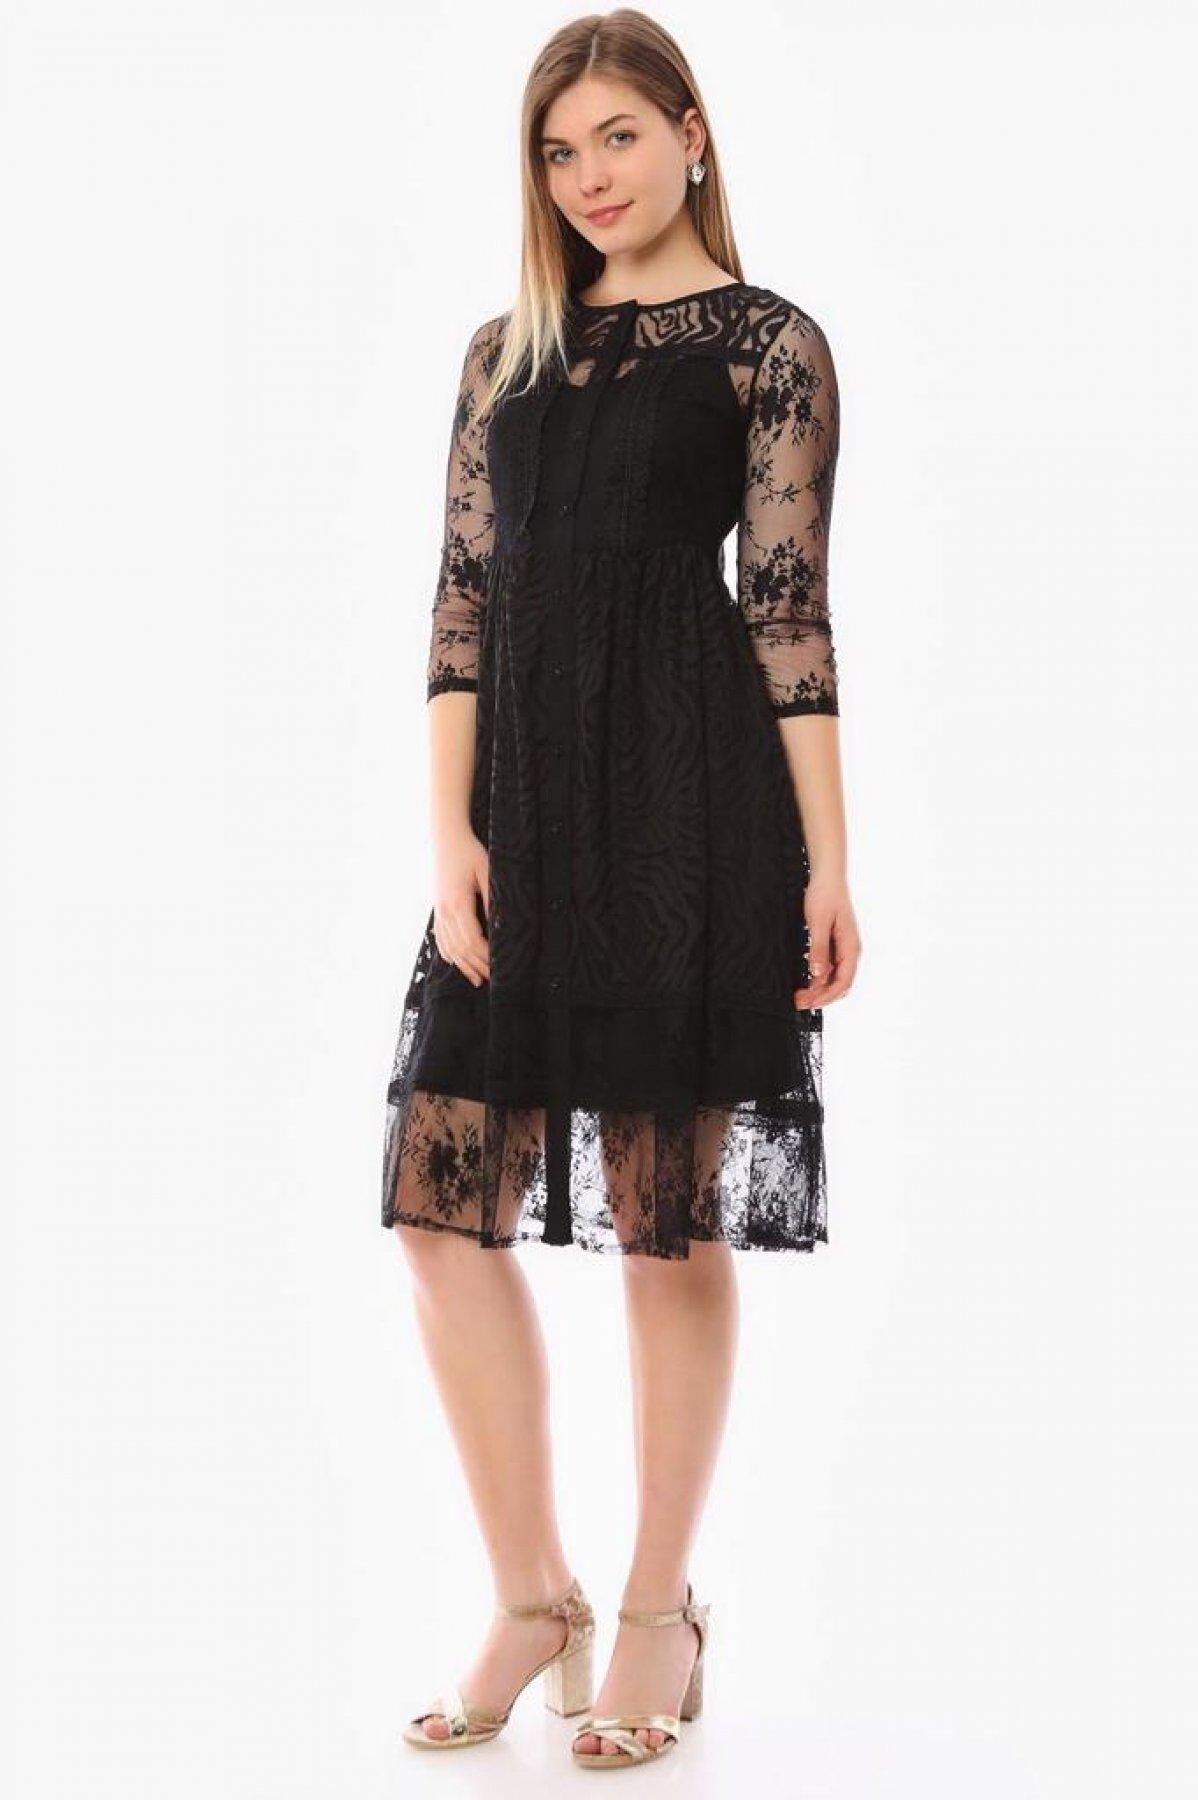 https://resim.oddamoda.com/p003592/siyah/machek-kadin-elbise-5404-54845-4363.jpg